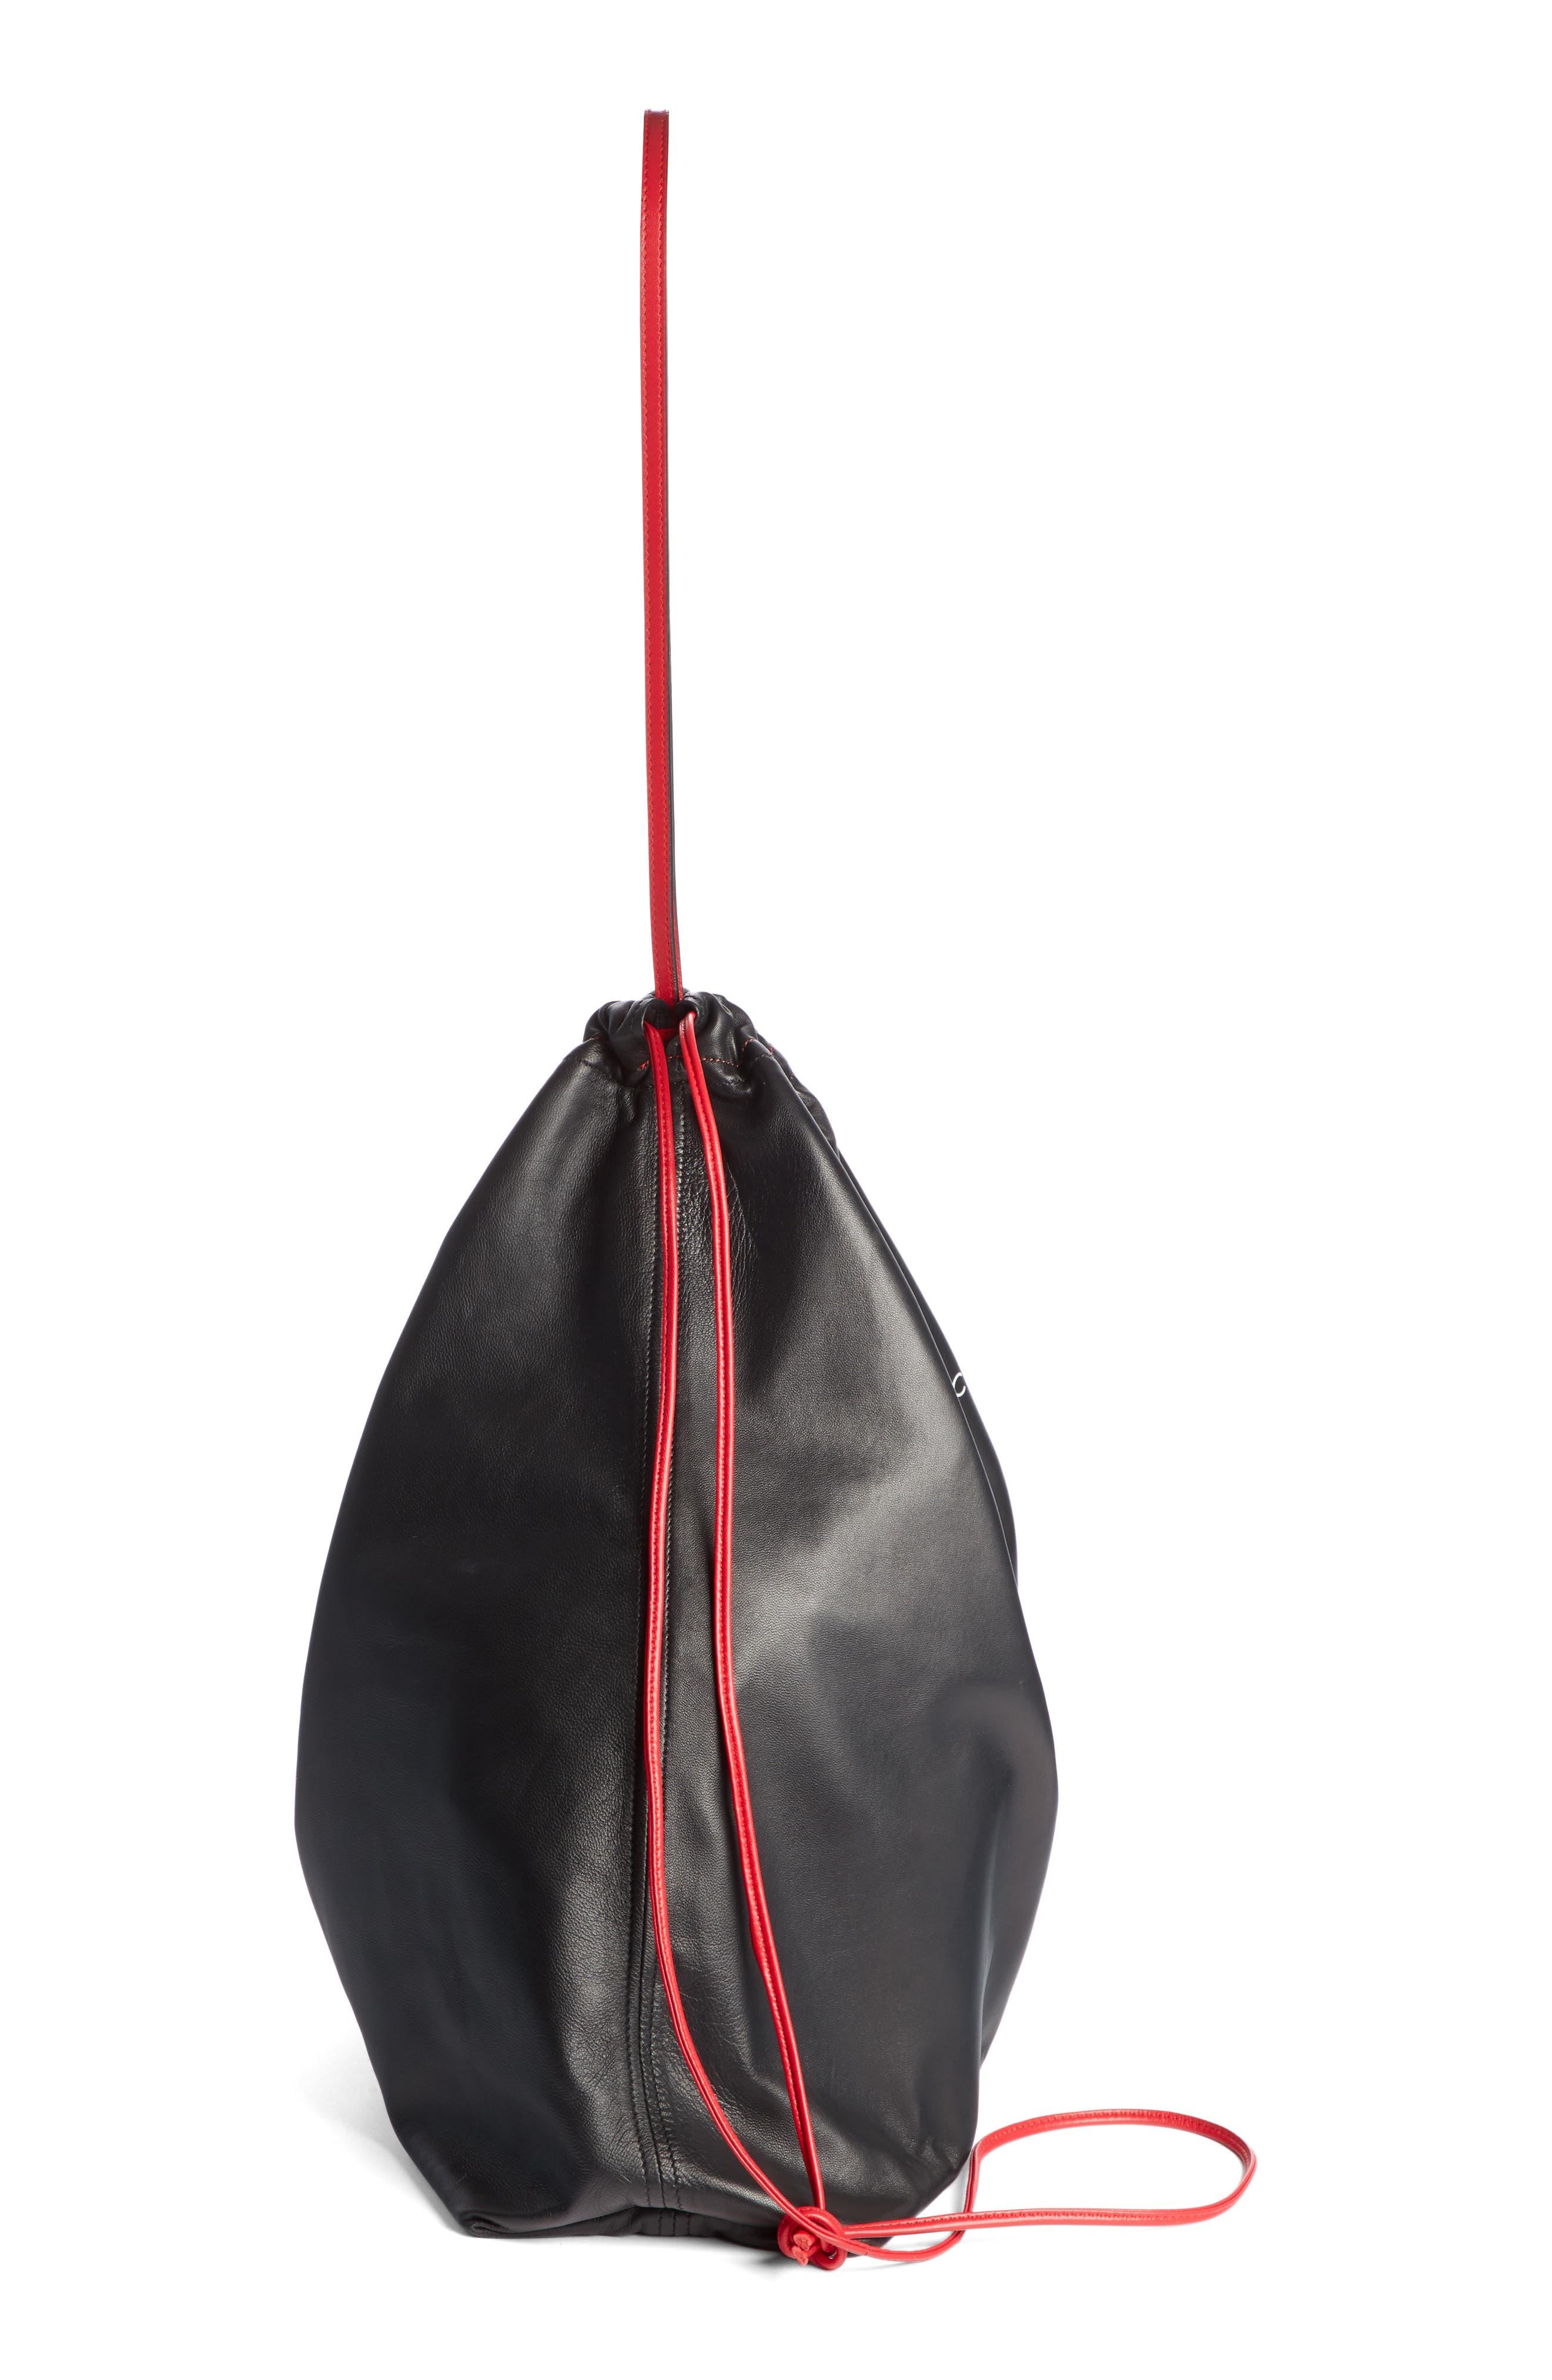 VICTORIA BECKHAM,                             36 Dover St Lambskin Leather Drawstring Bag,                             Alternate thumbnail 4, color,                             BLACK